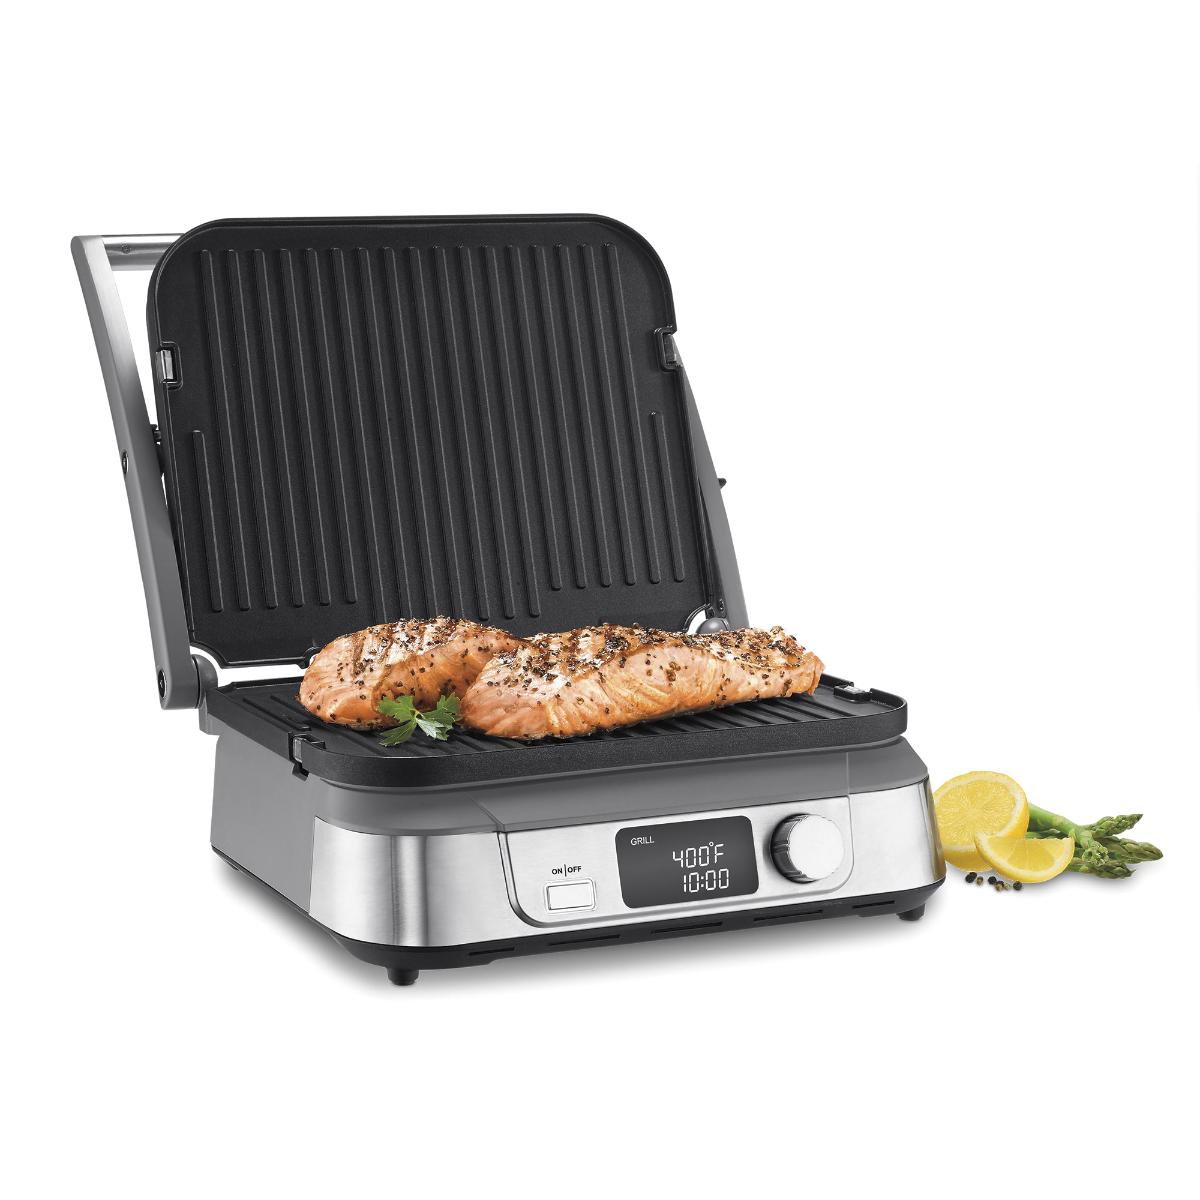 Parrilla eléctrica de aluminio Cuisinart®